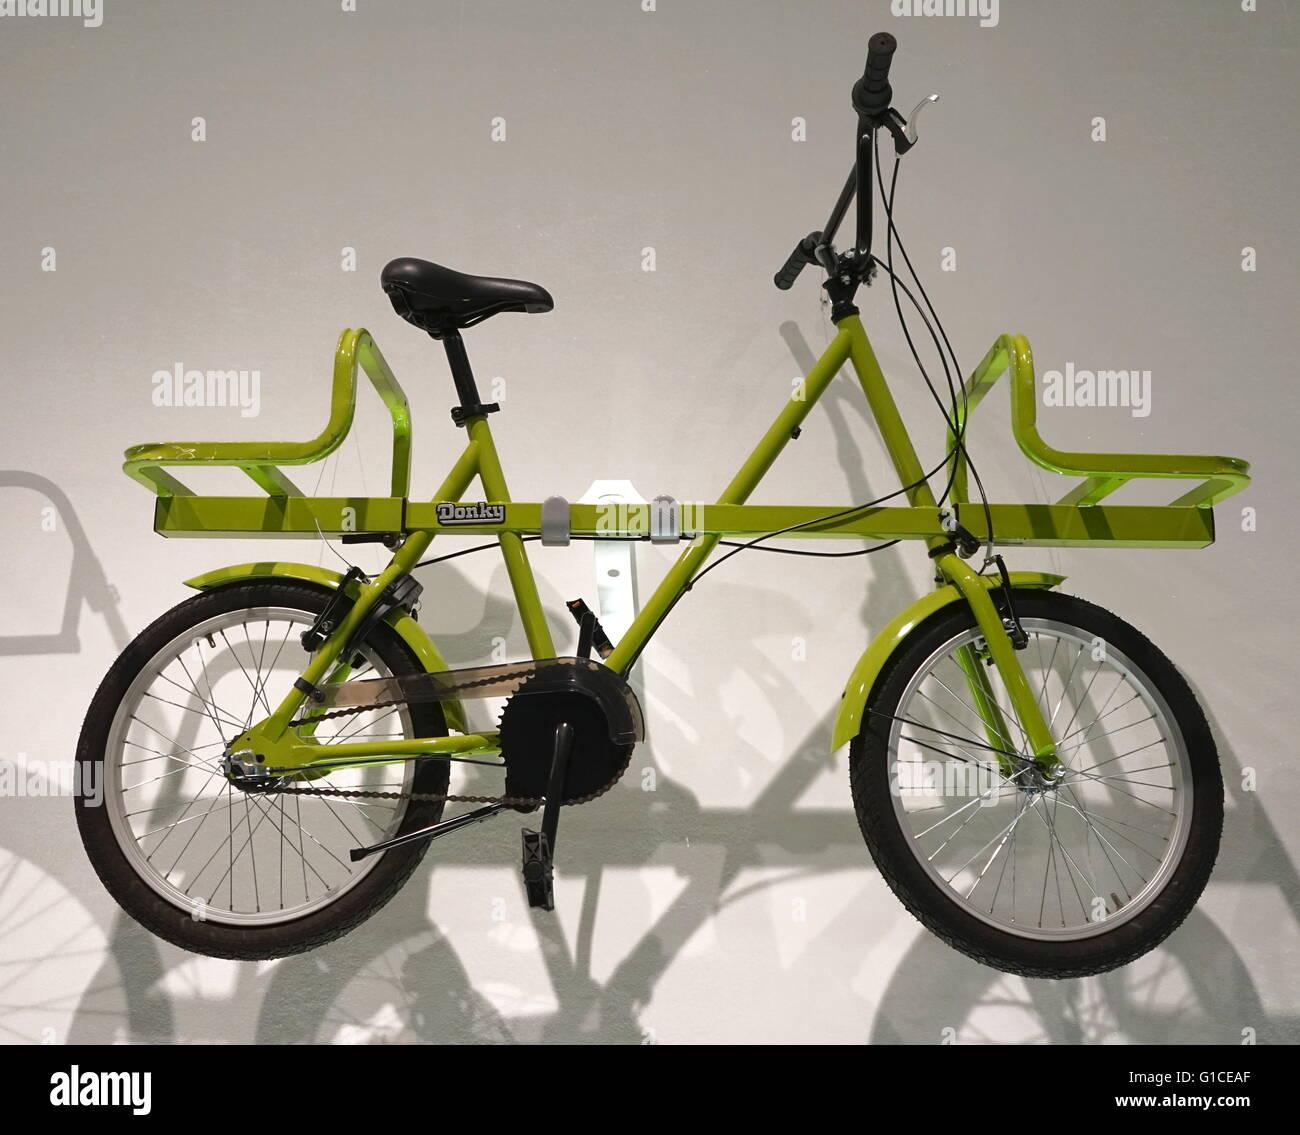 Donkey Bike designed by Ben Wilson. Dated 2015 - Stock Image